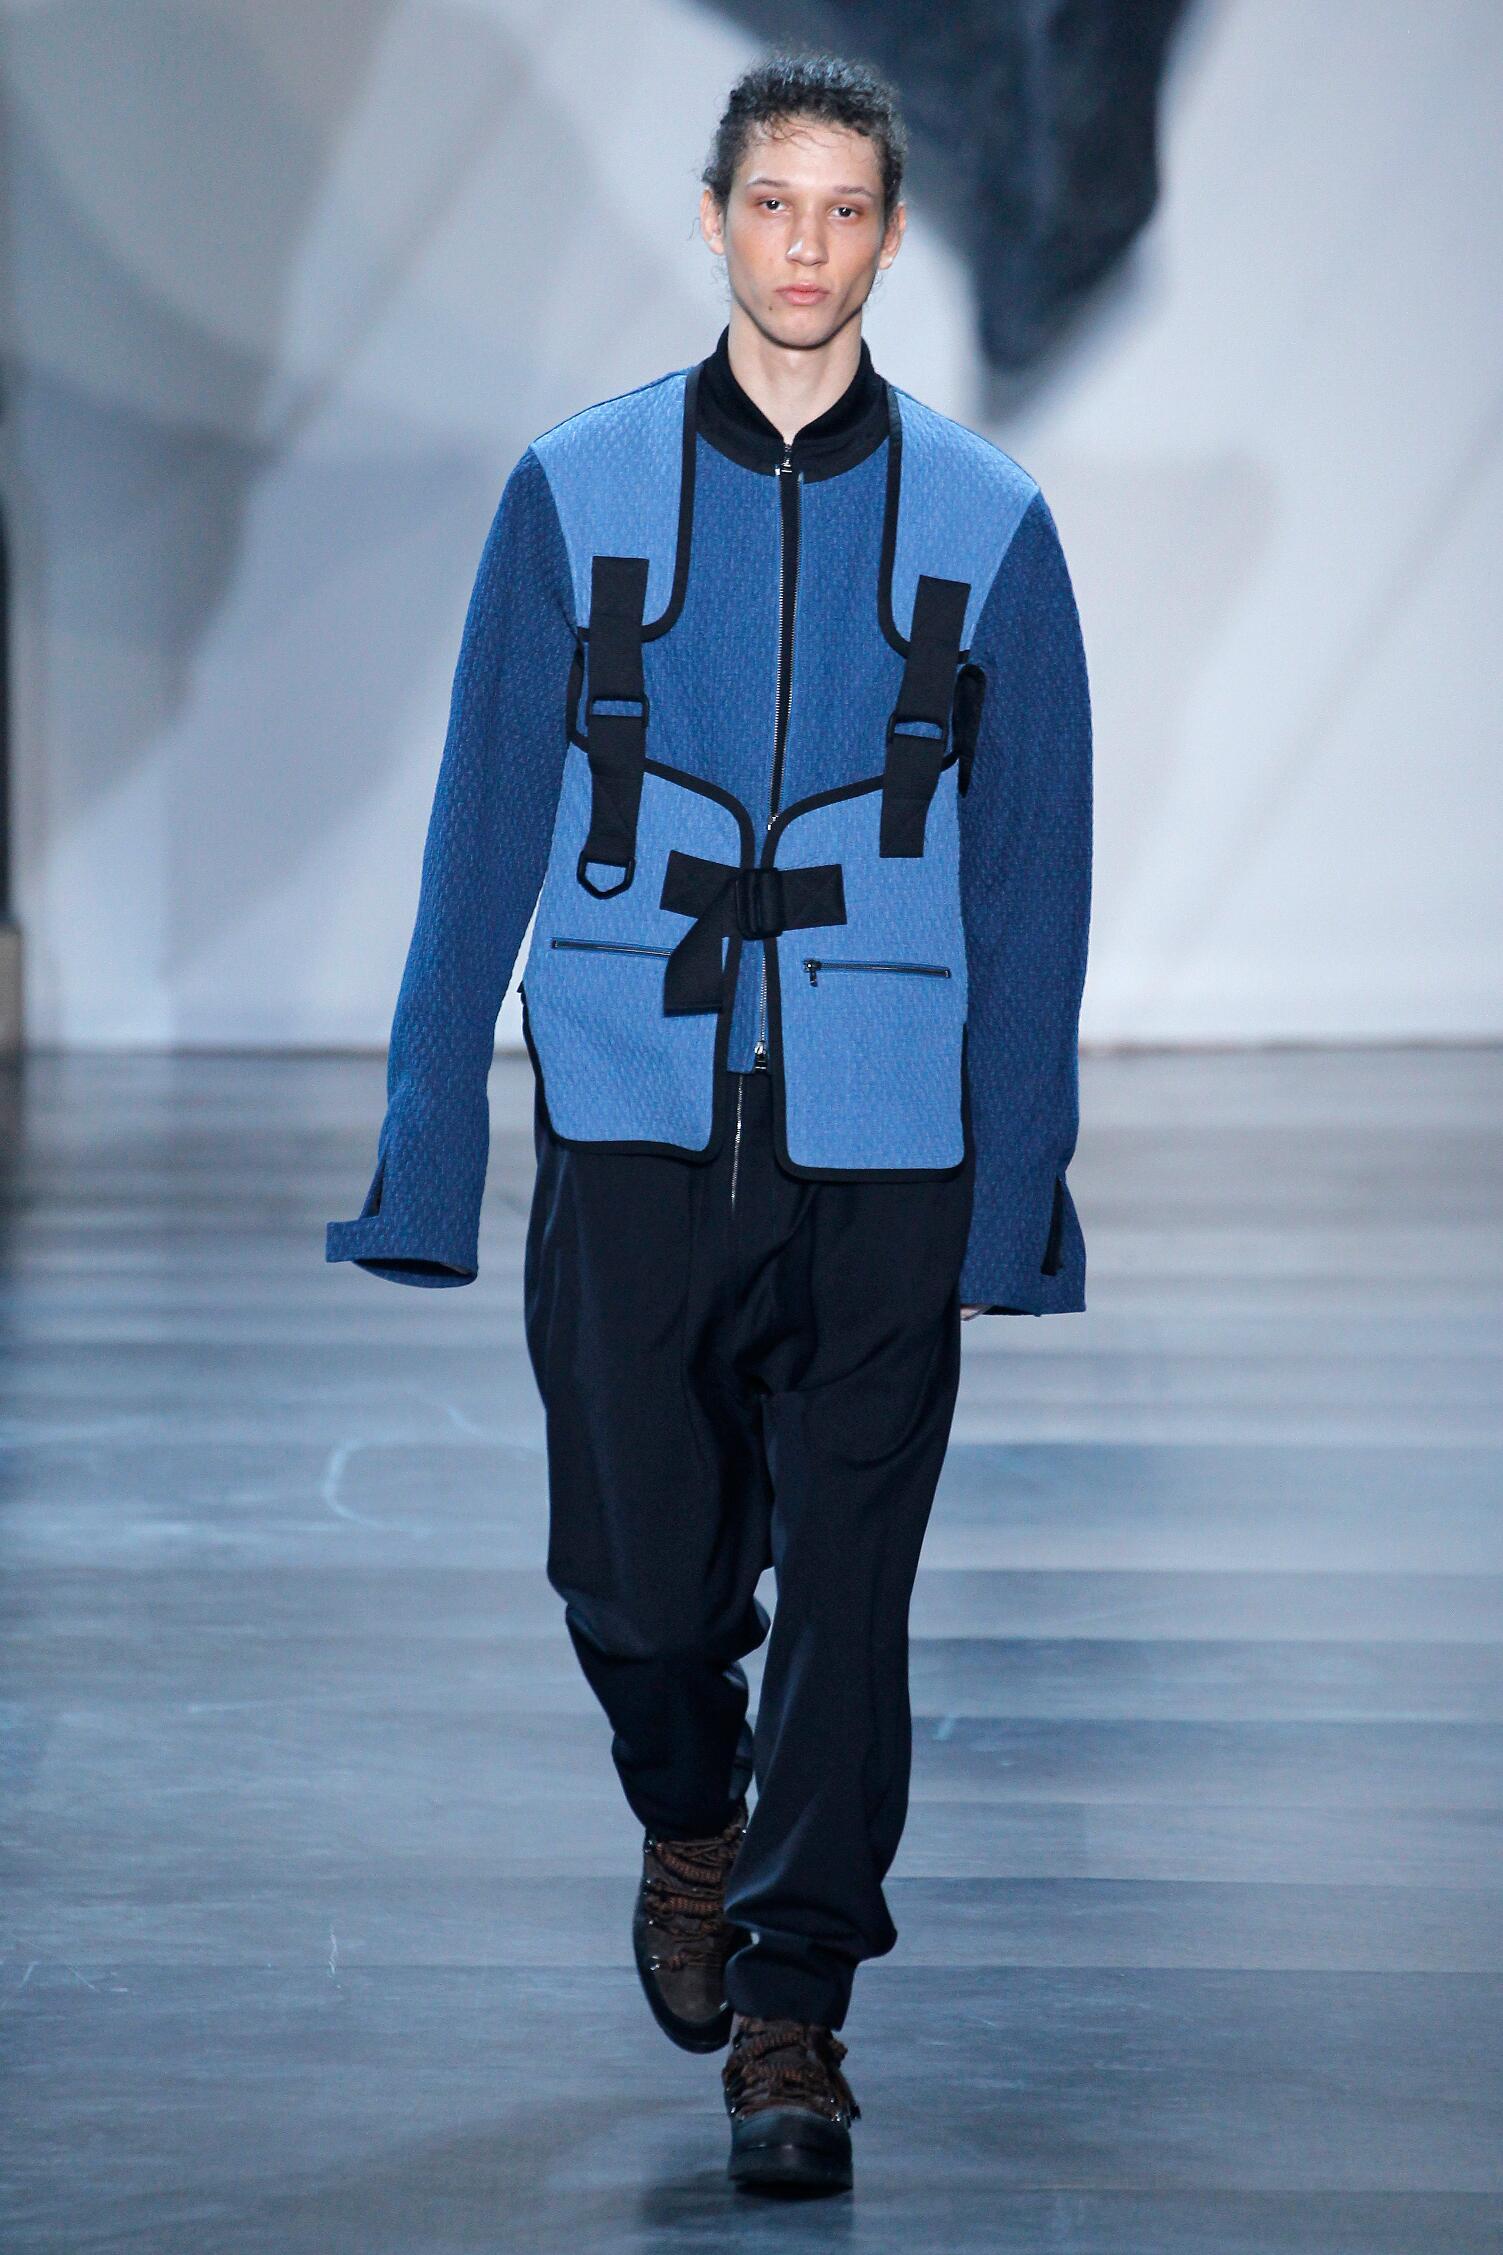 Style Men 3.1 Phillip Lim Collection